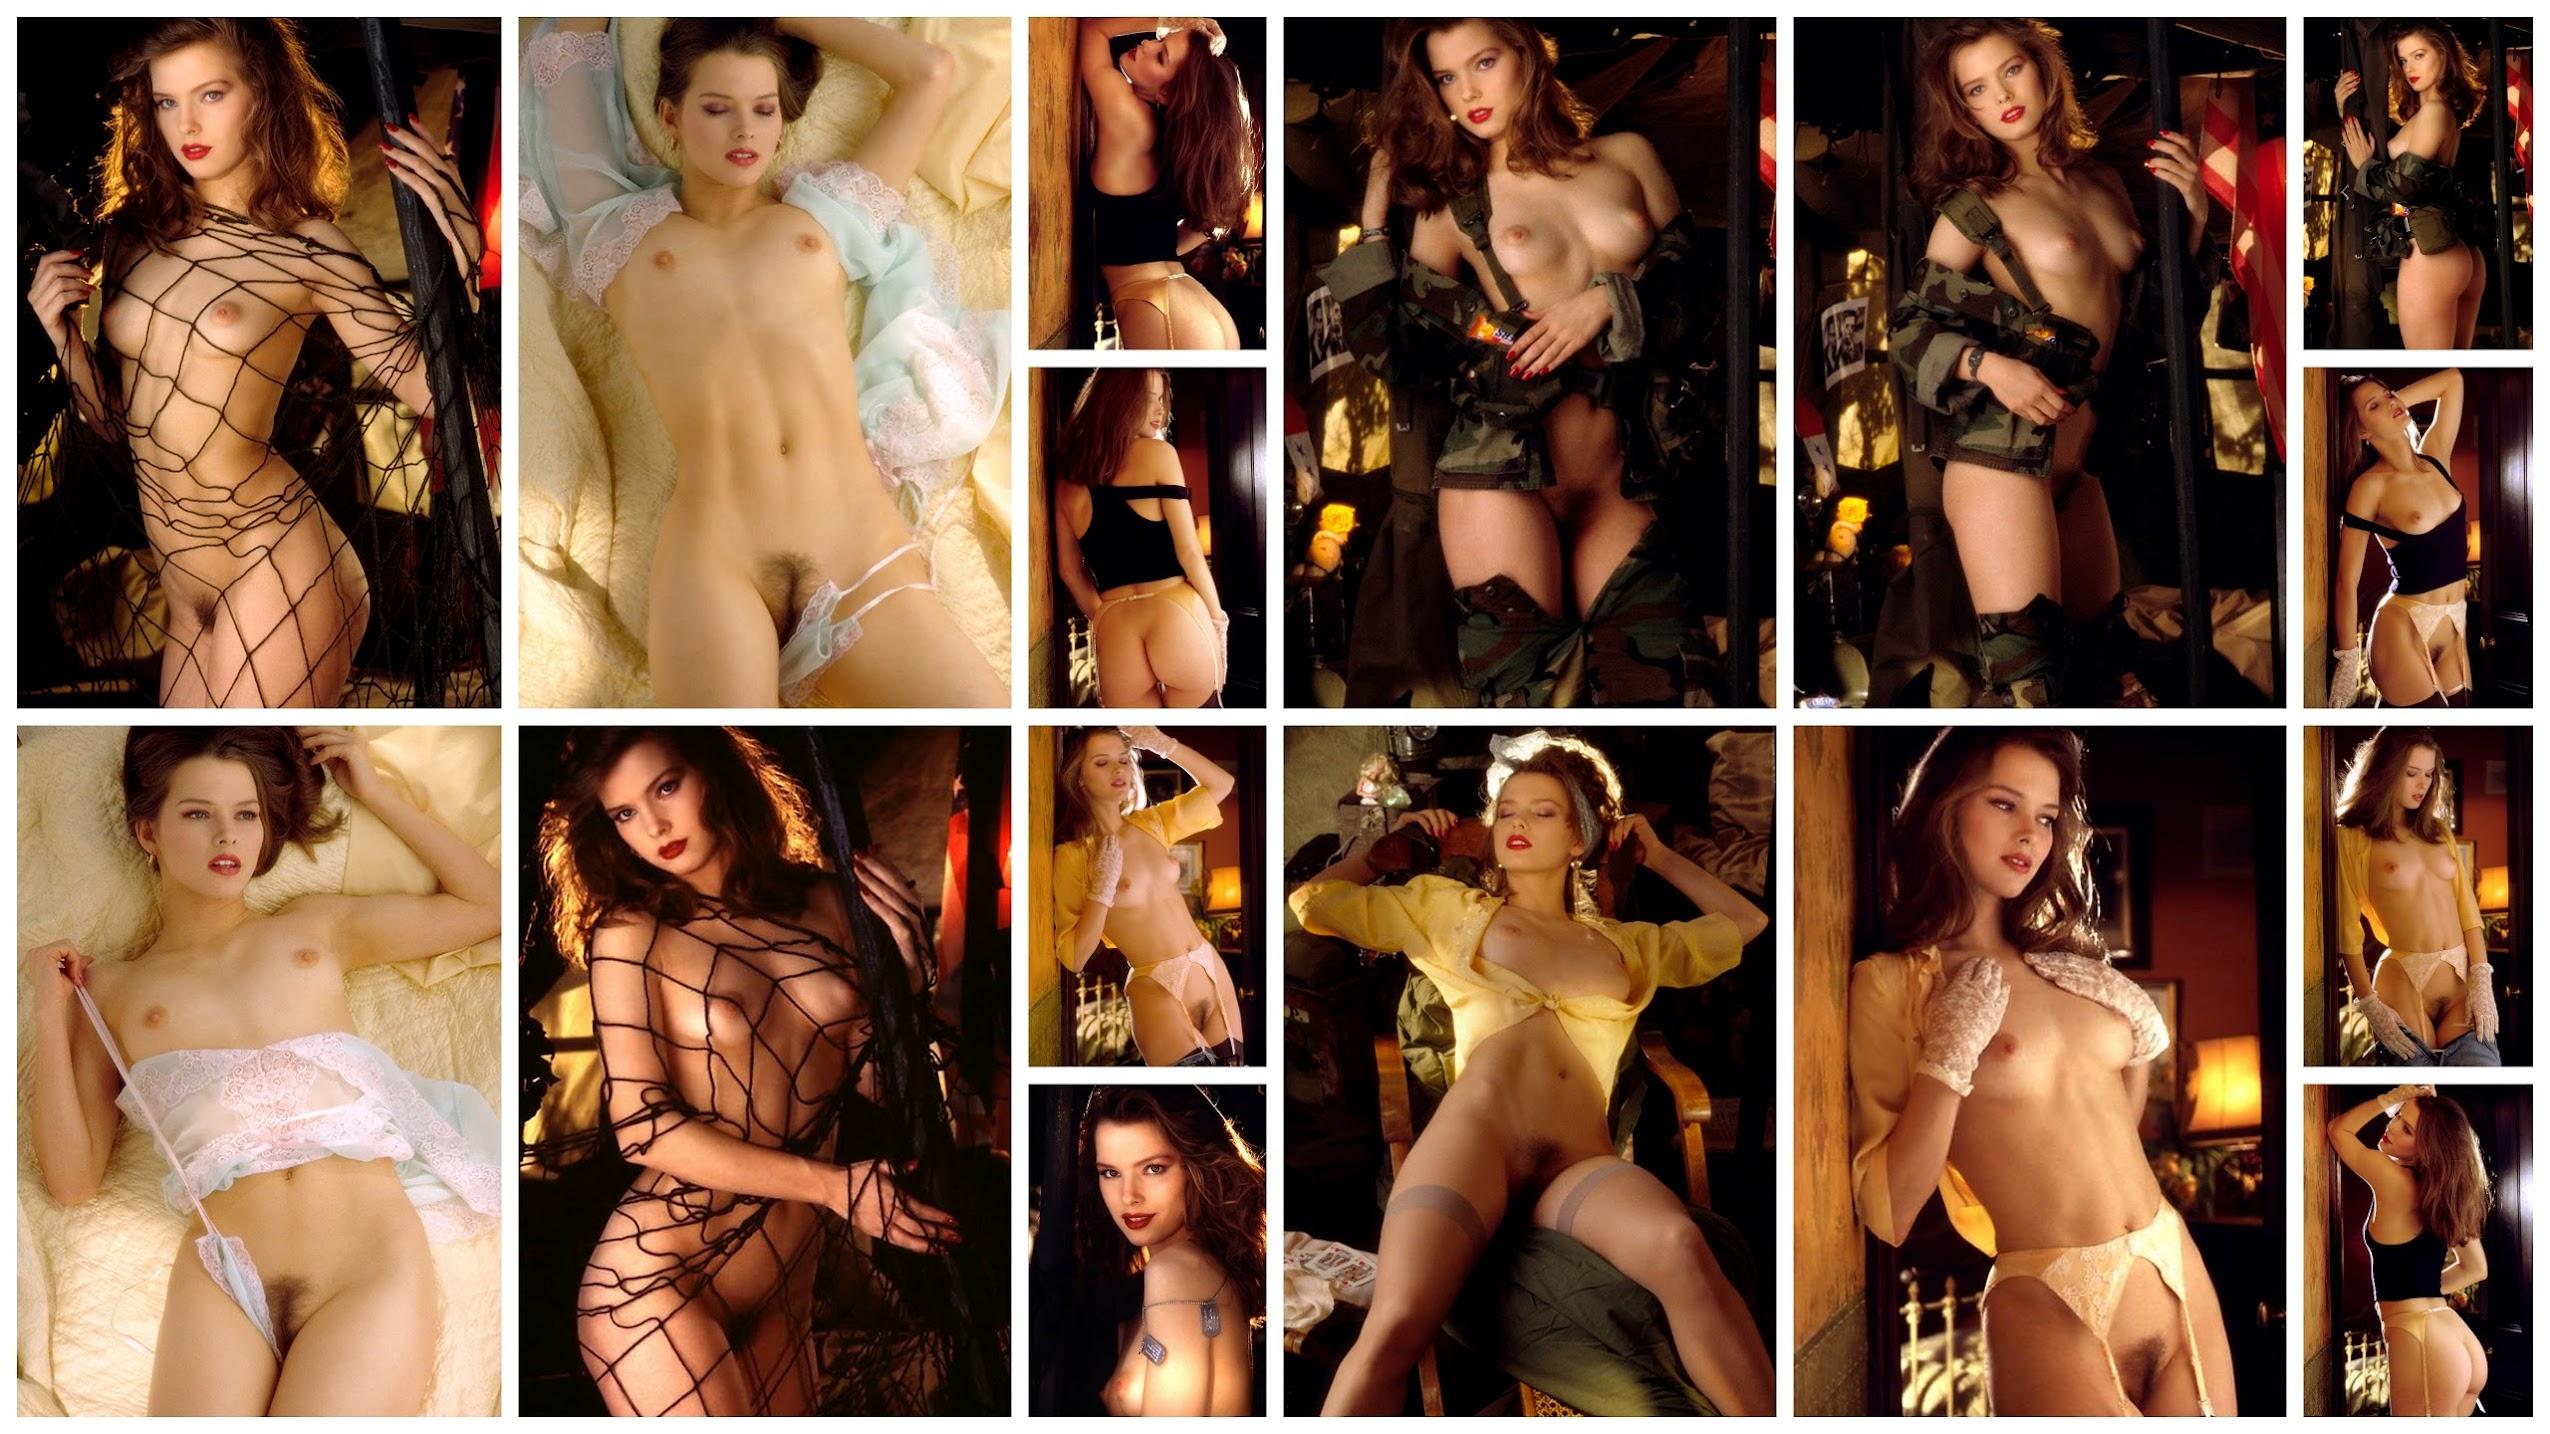 Agnes Www Vintage Erotica Forum Porn Images